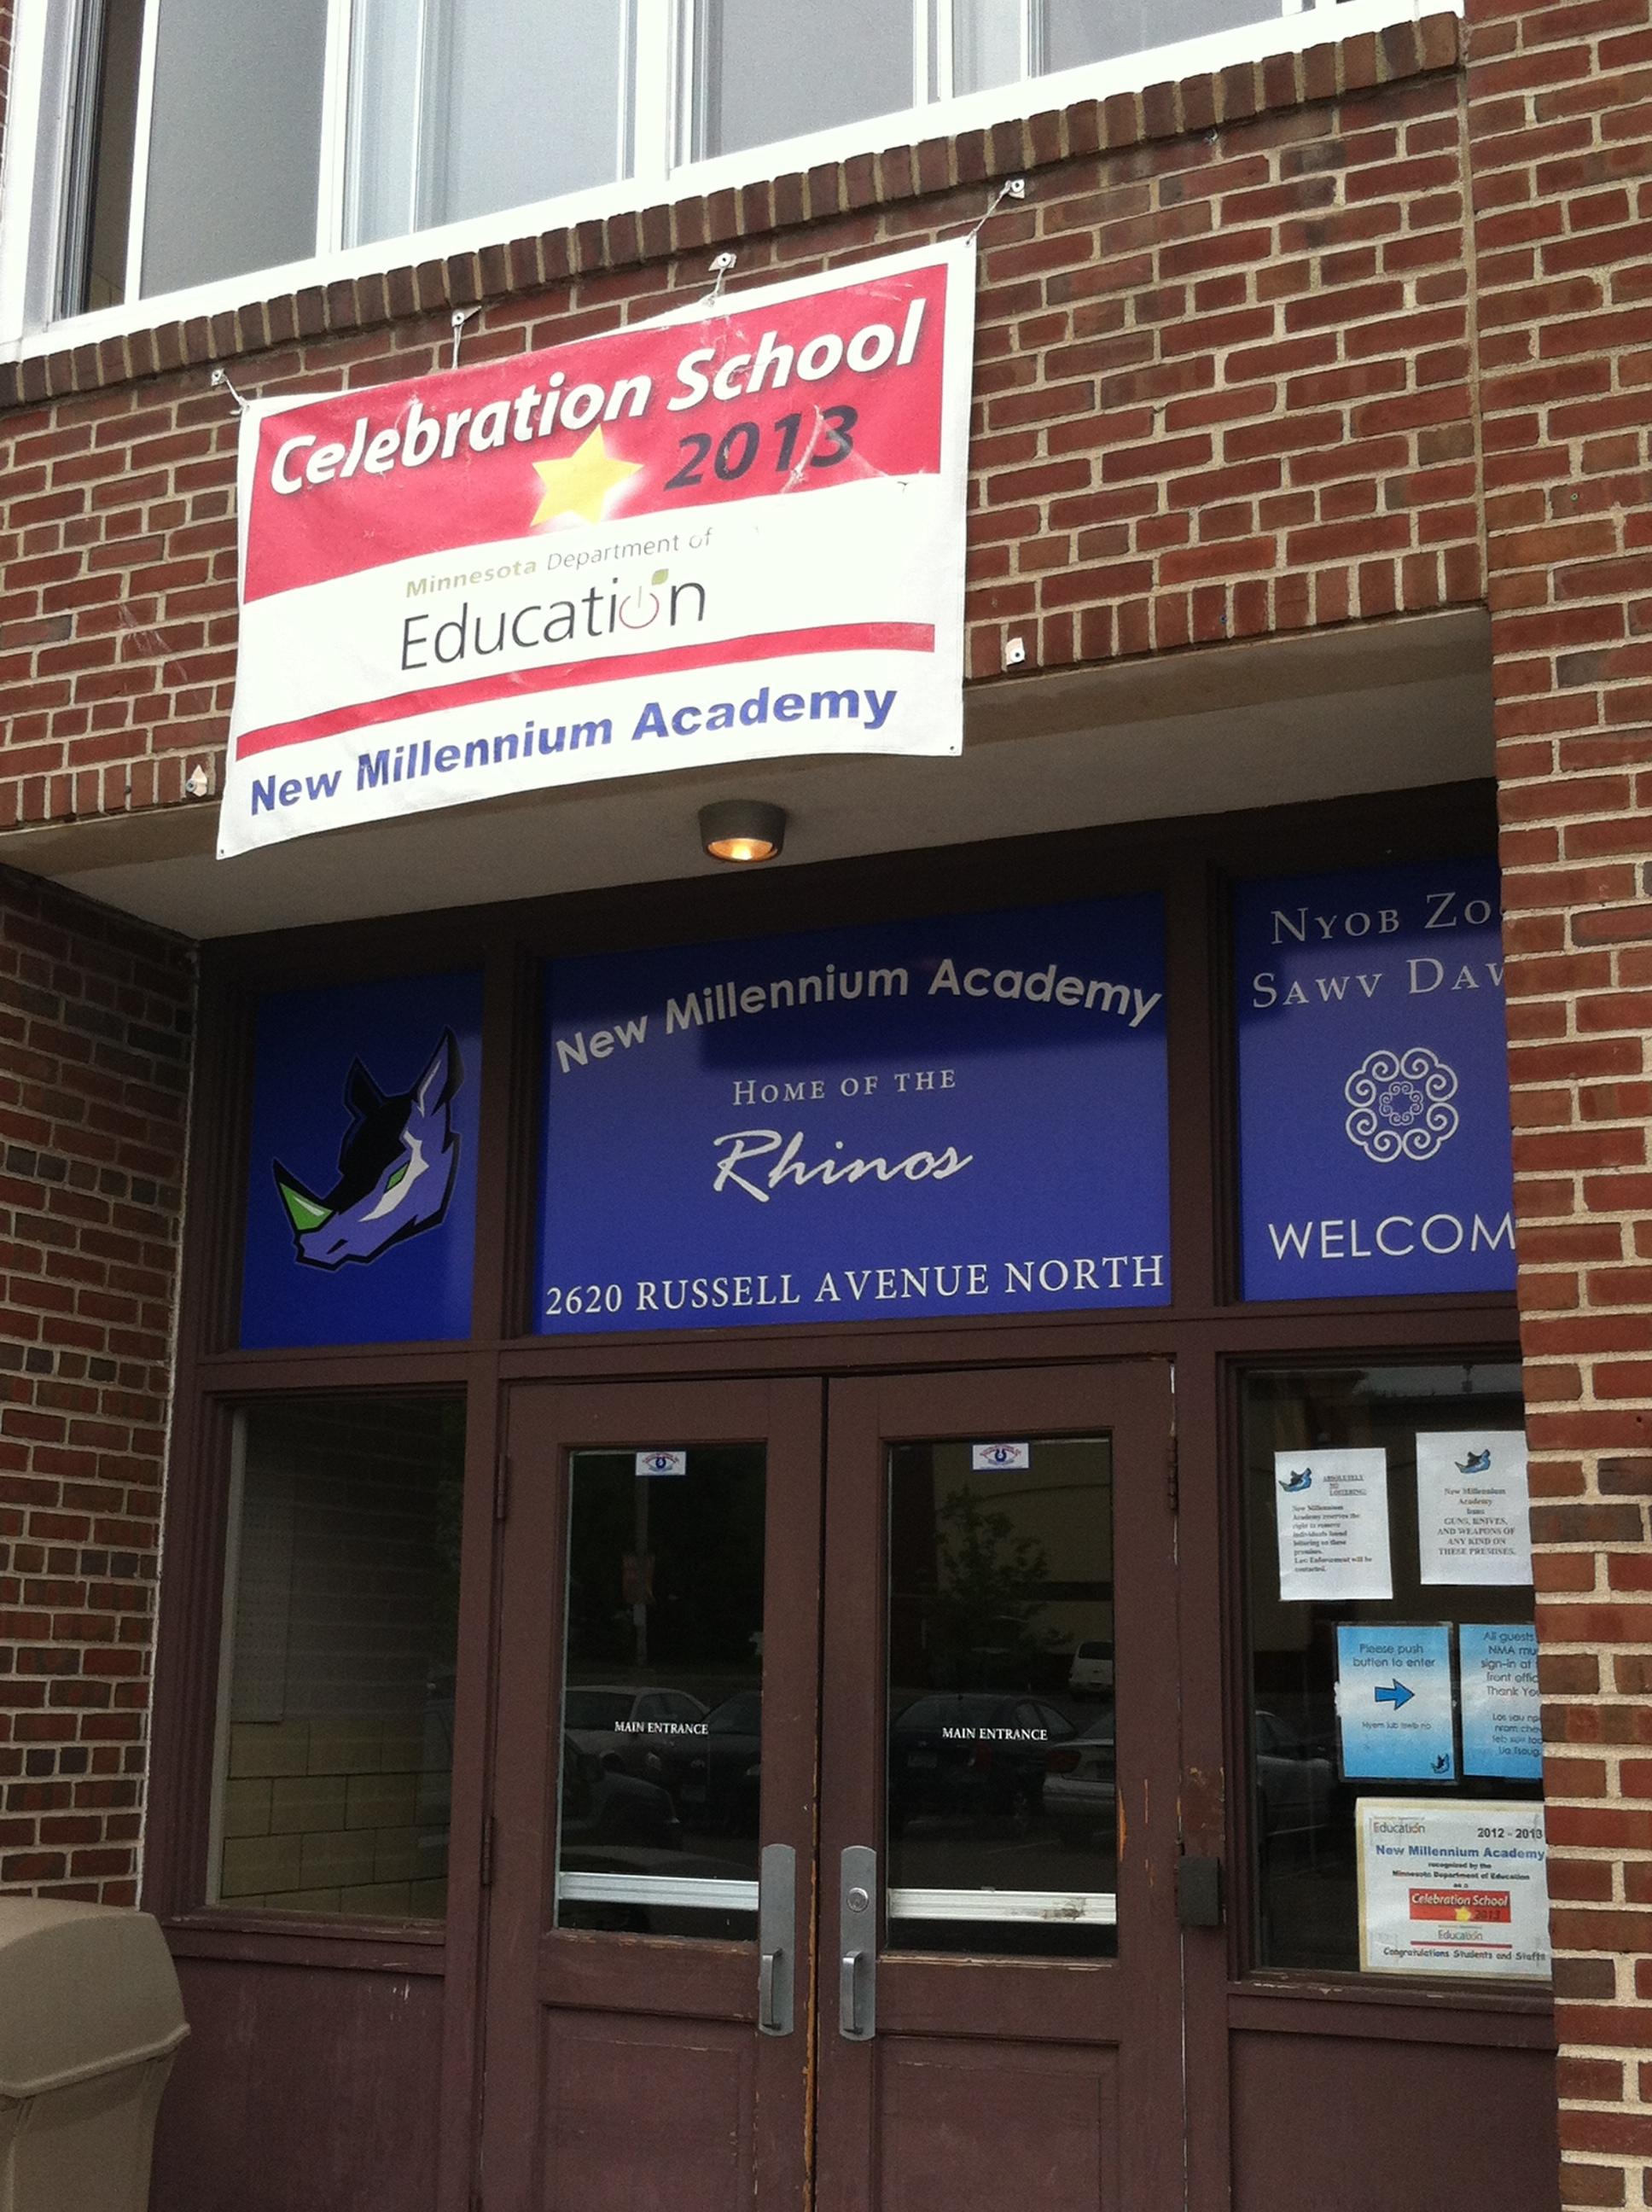 celebration_school